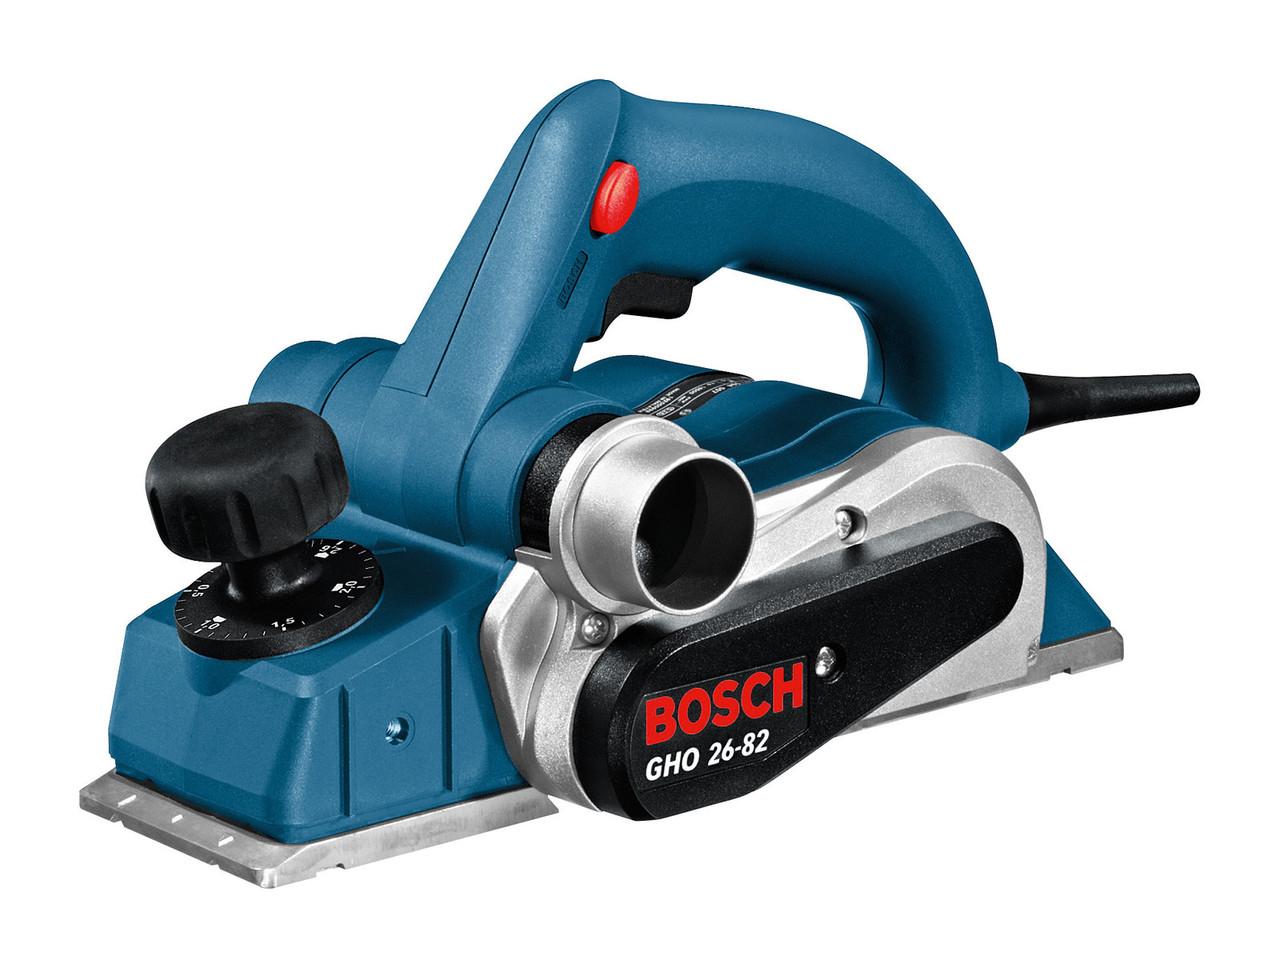 Рубанок электрический Bosch GHO 26-82 0601594103